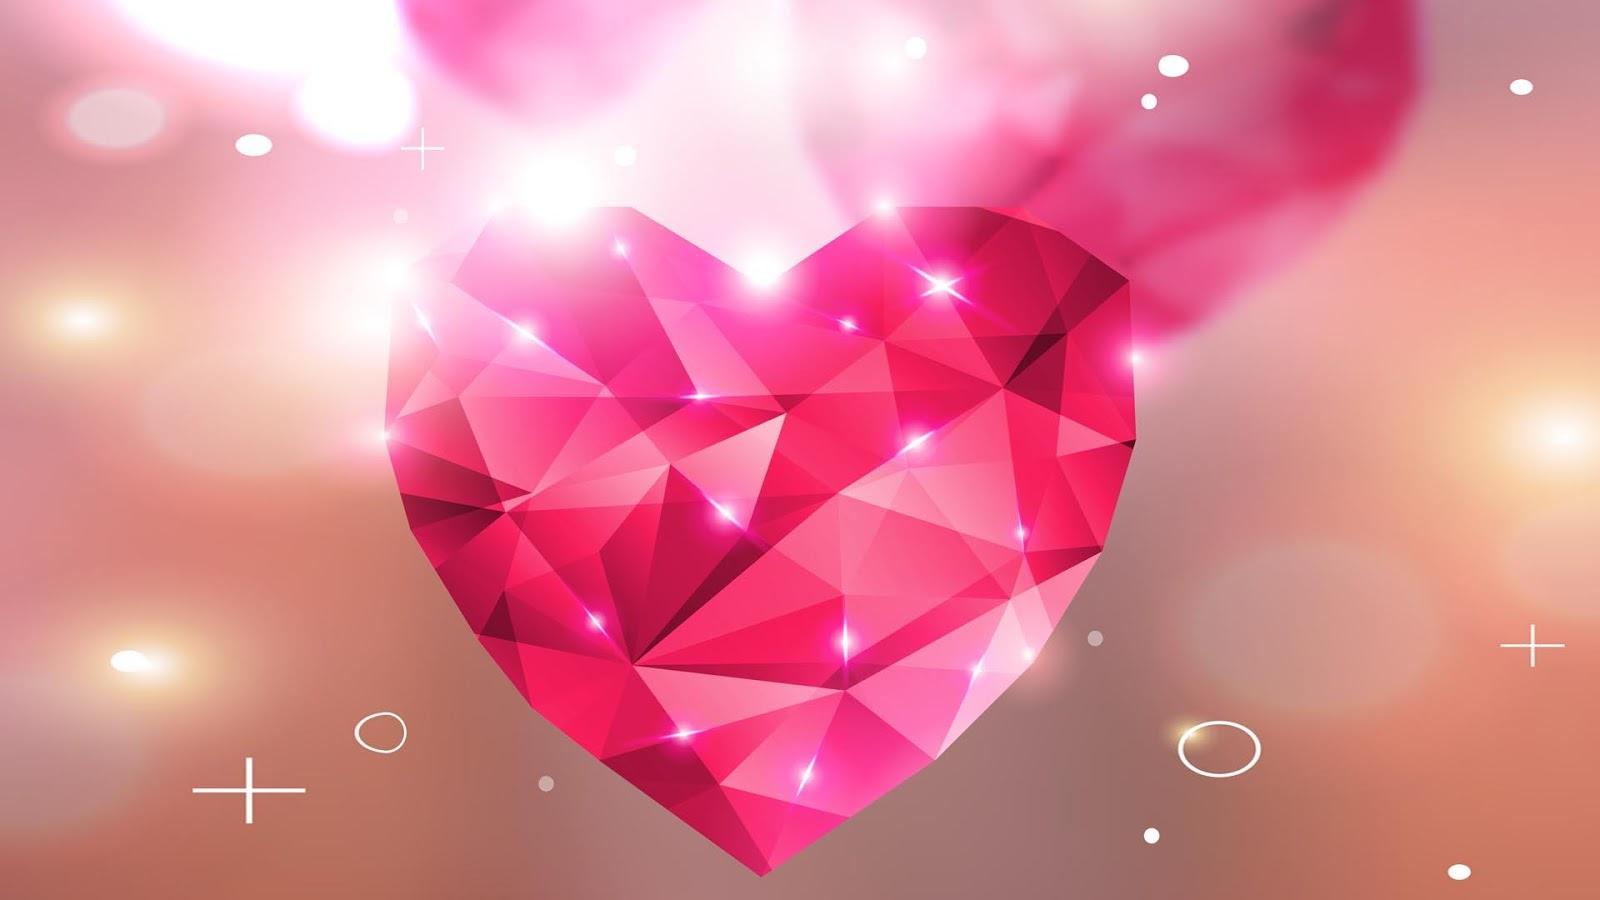 Beautiful Love Heart Wallpaper HD Pics One HD Wallpaper 1600x900